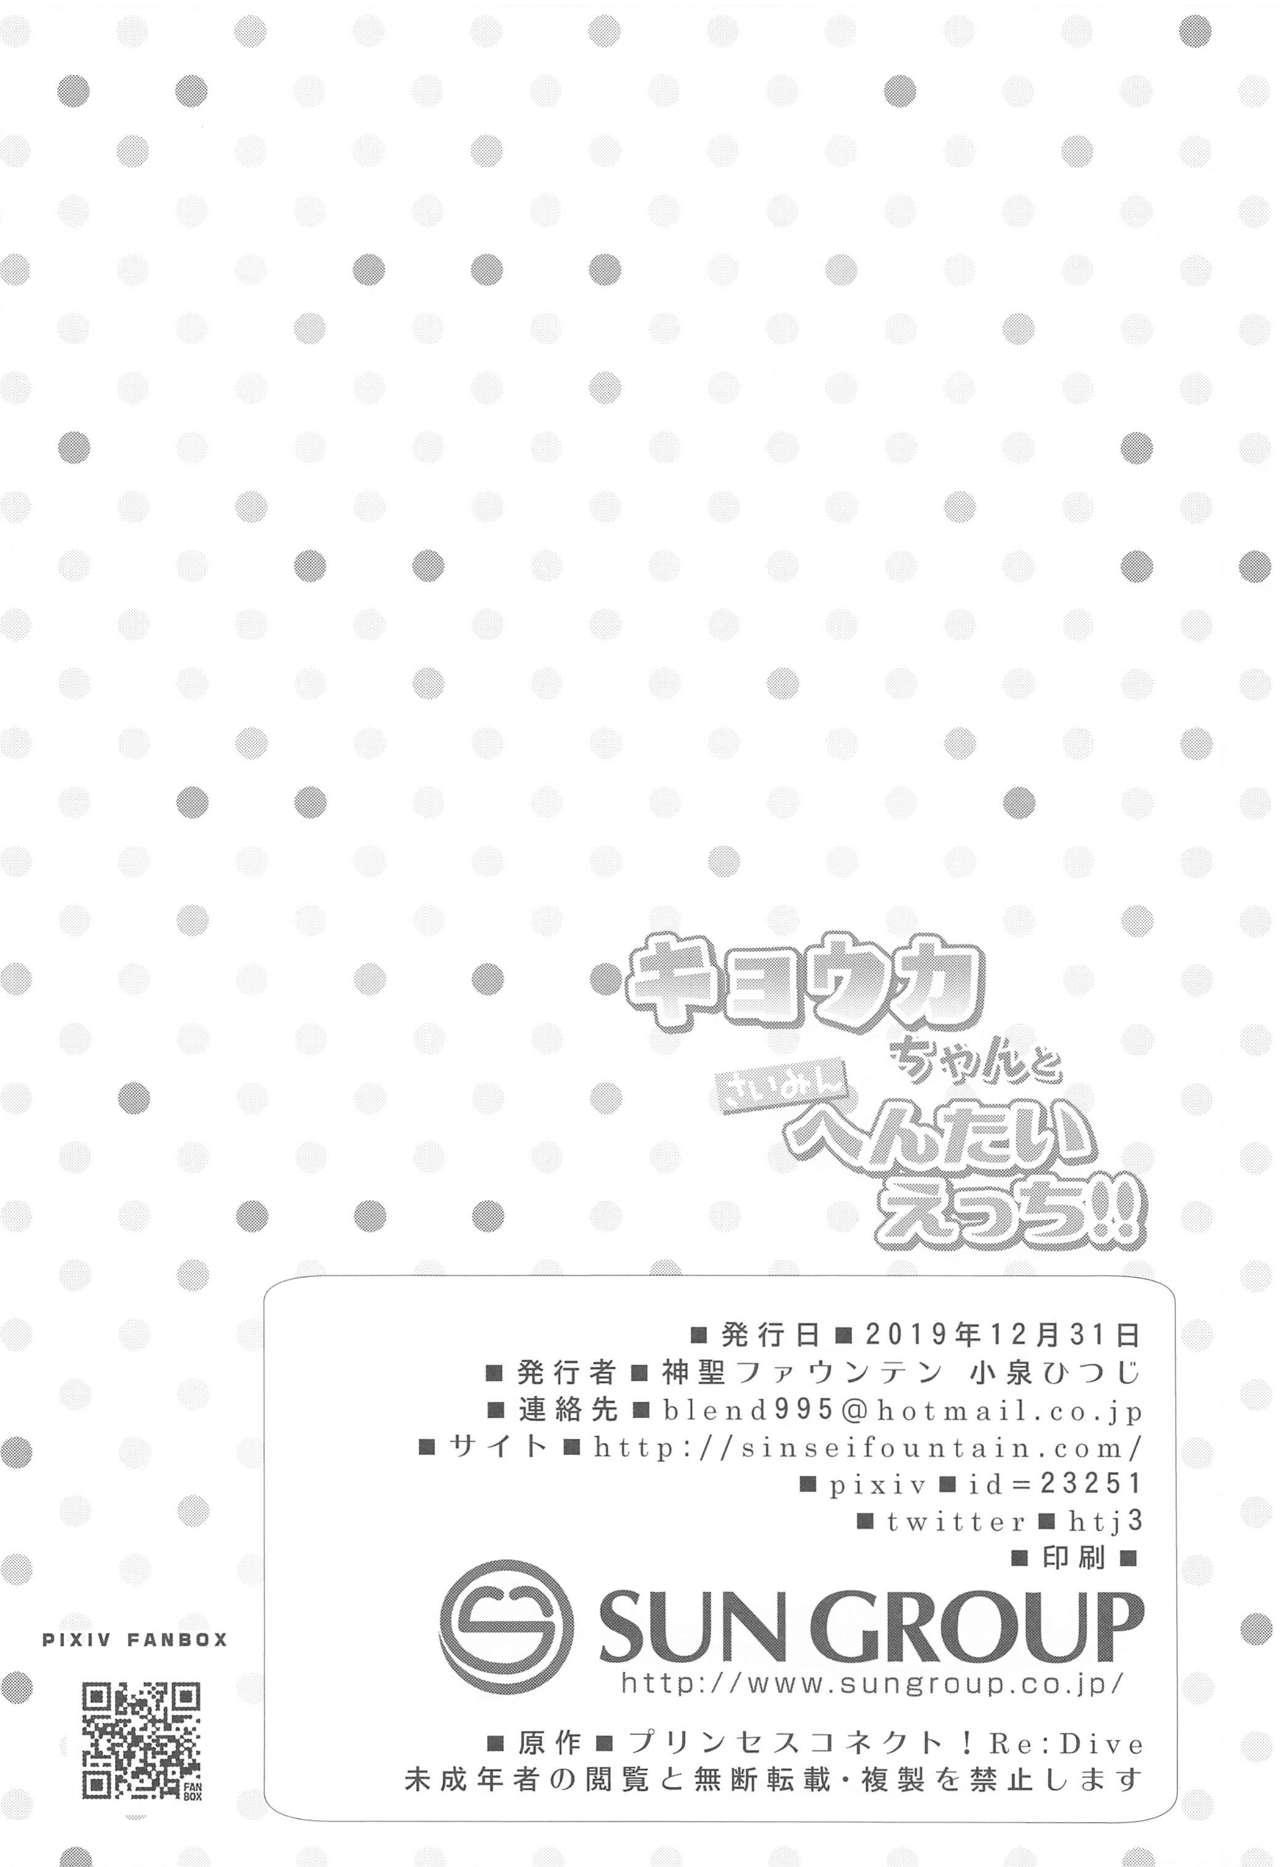 Kyouka-chan to Saimin Hentai Ecchi!! 24